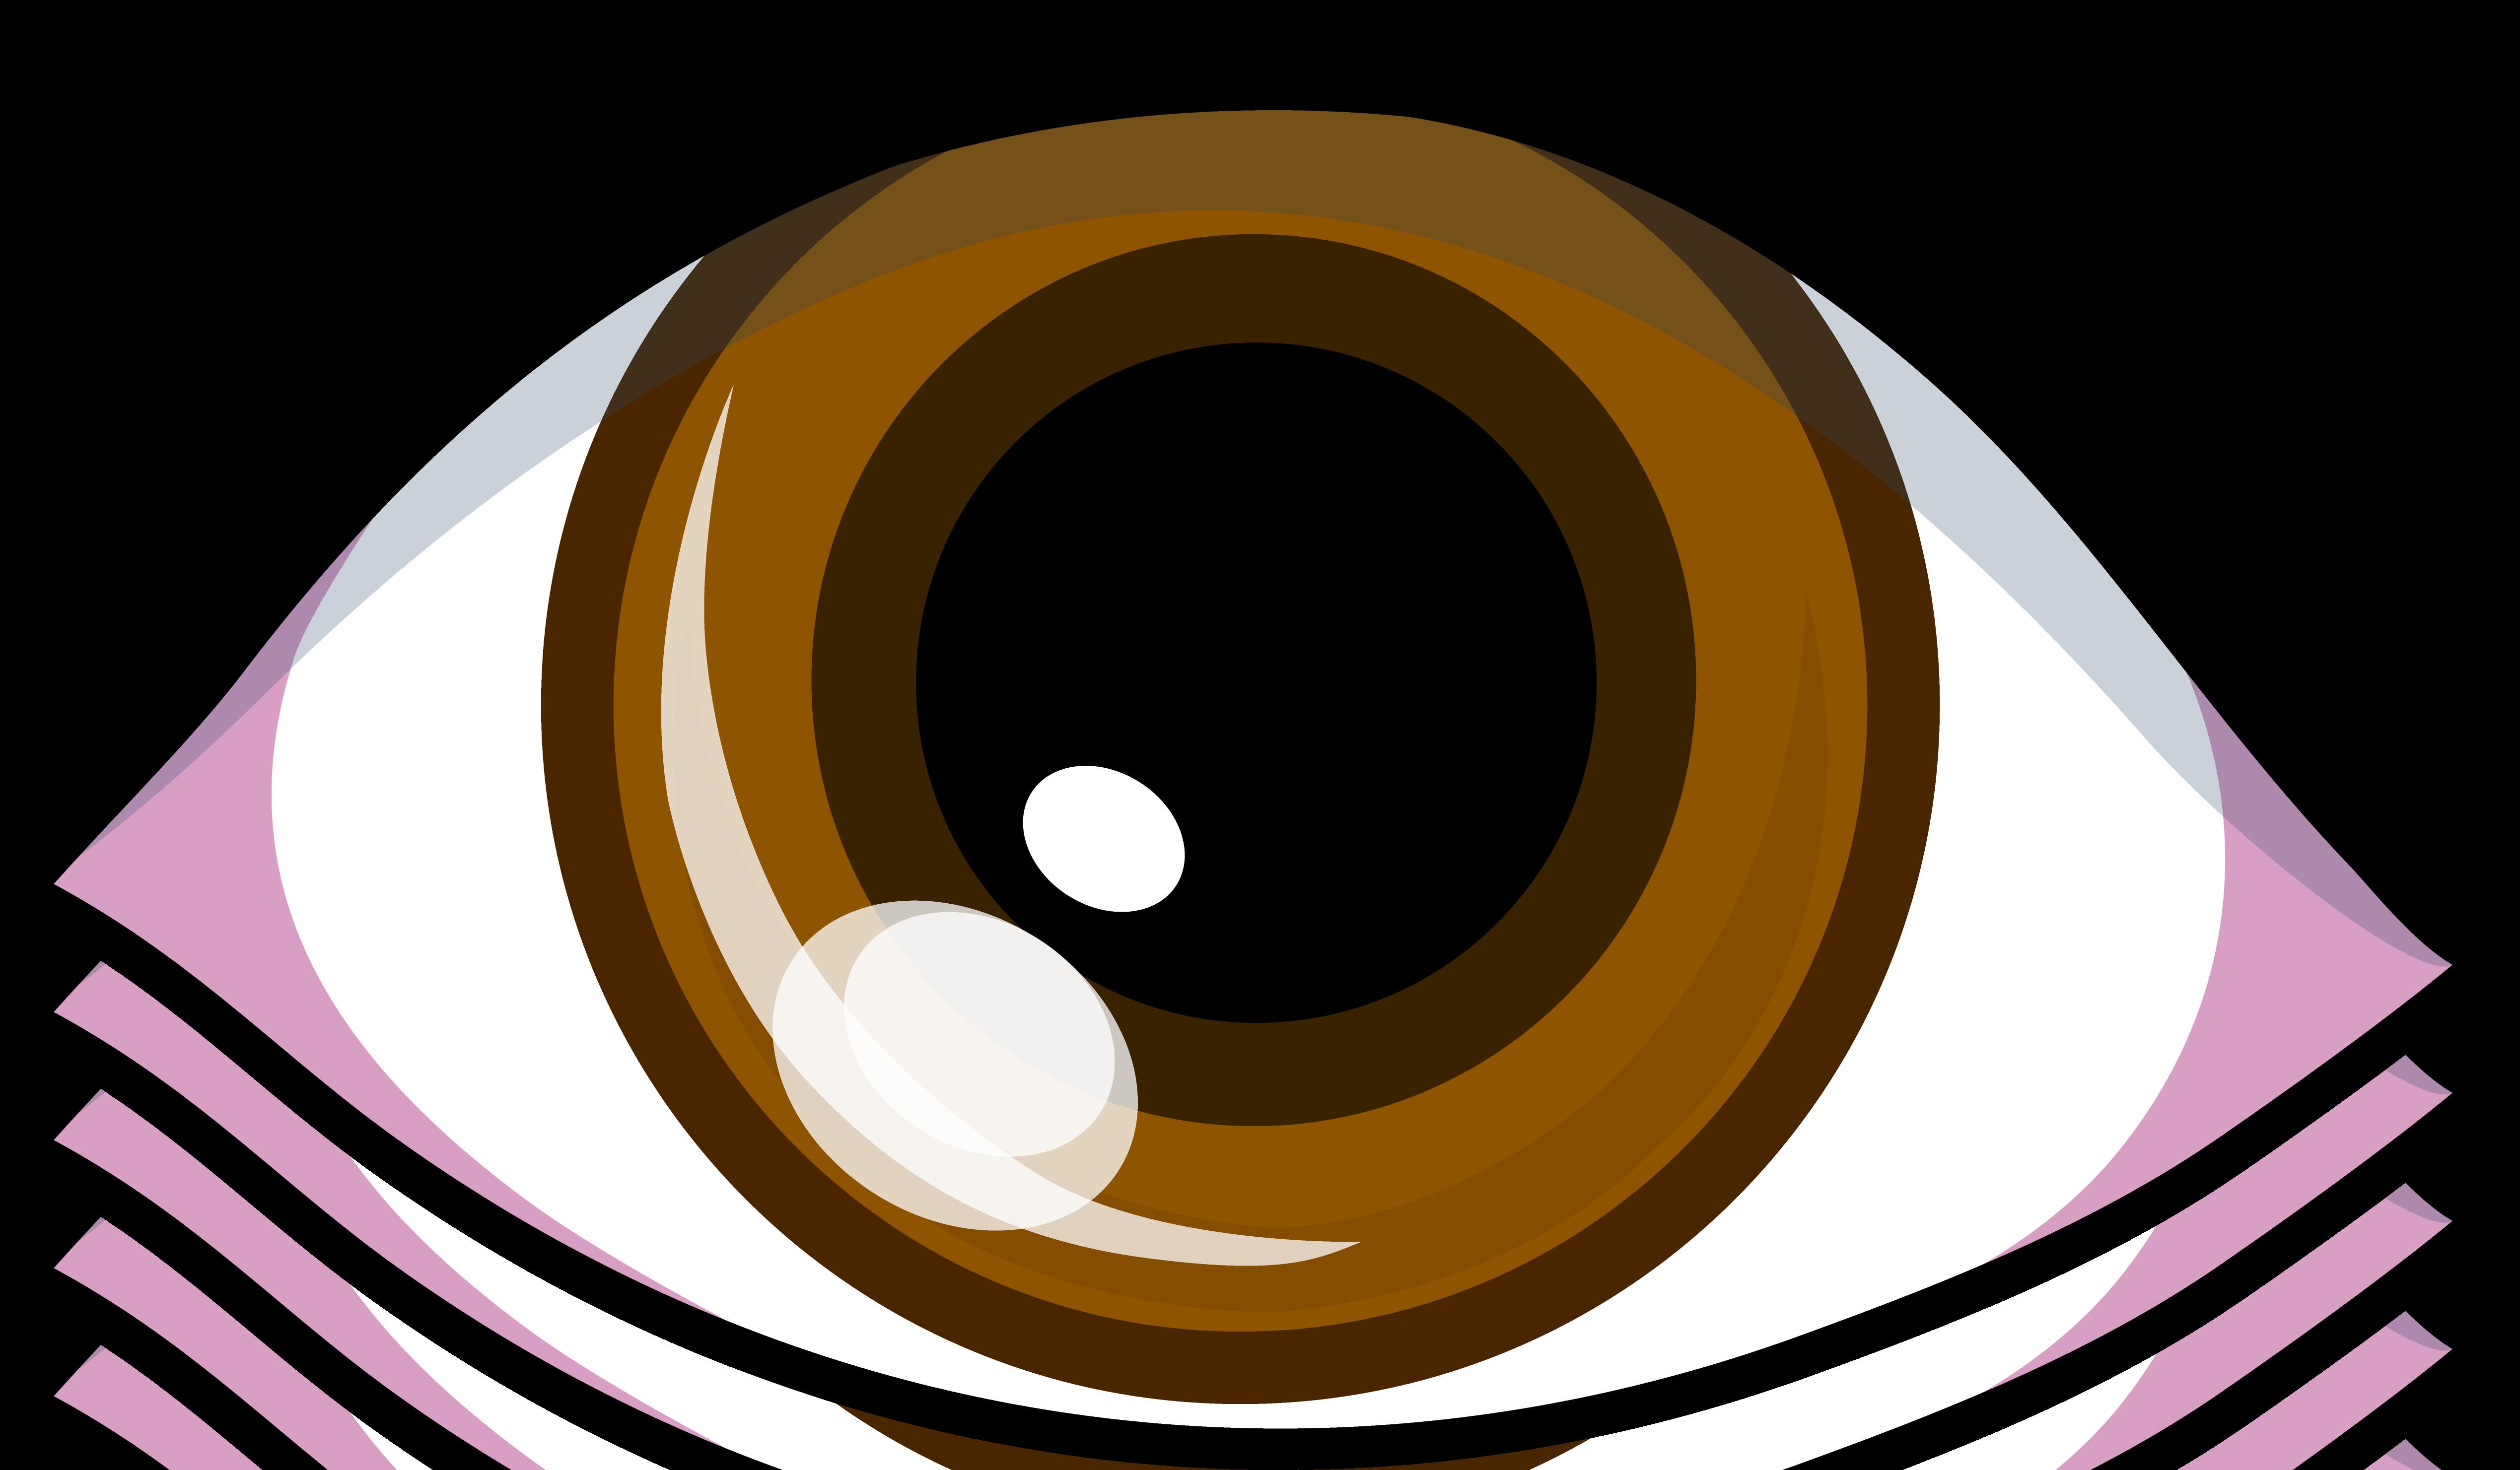 Clipart eyes bored. Brown eye drawing panda